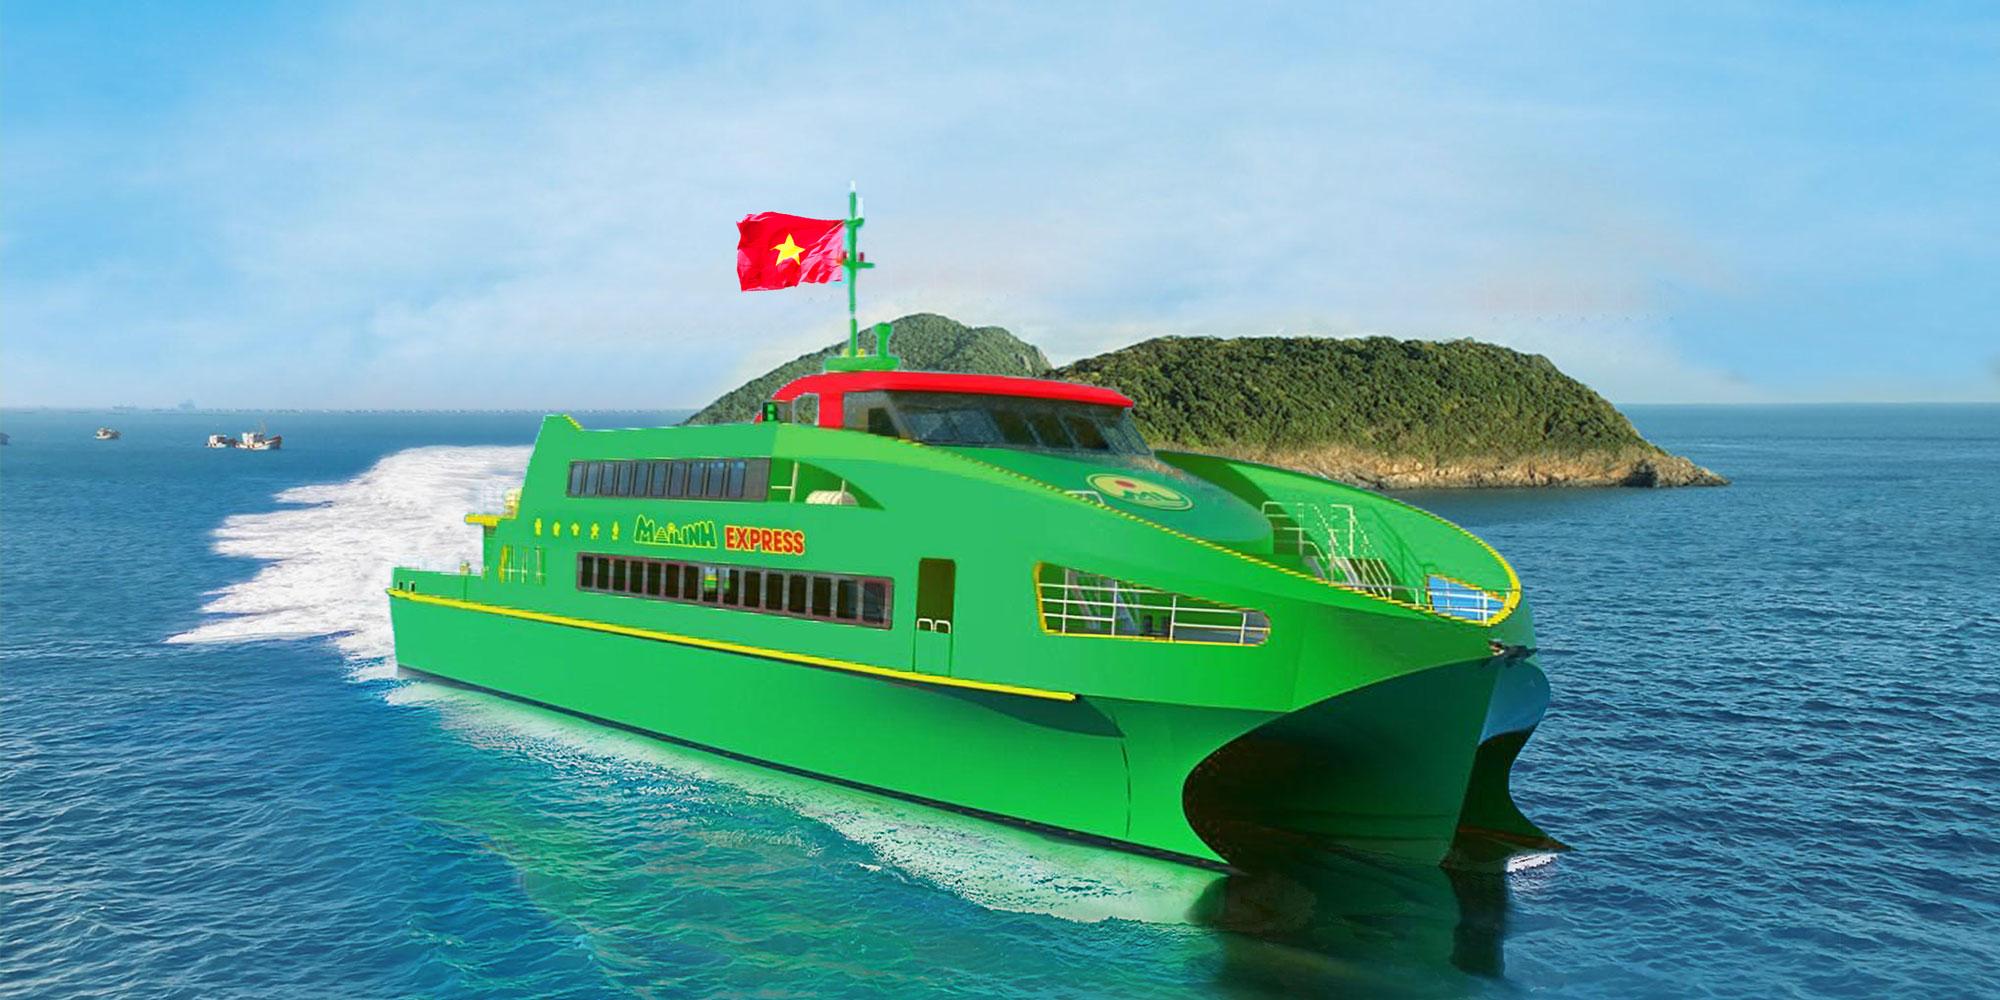 Tàu cao tốc Mai Linh Express